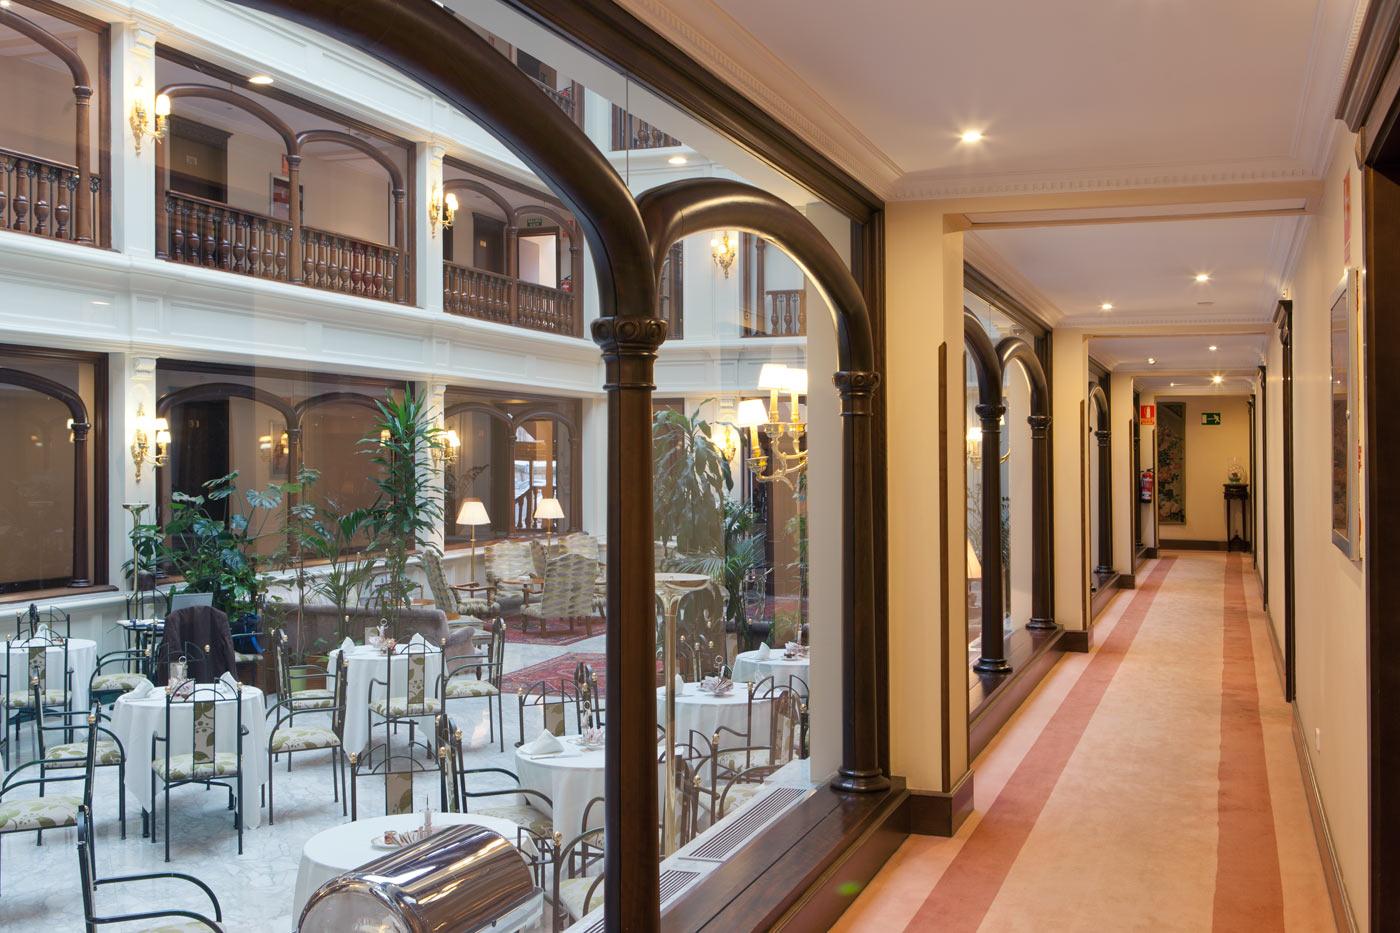 Hotel Don Pio - Hall